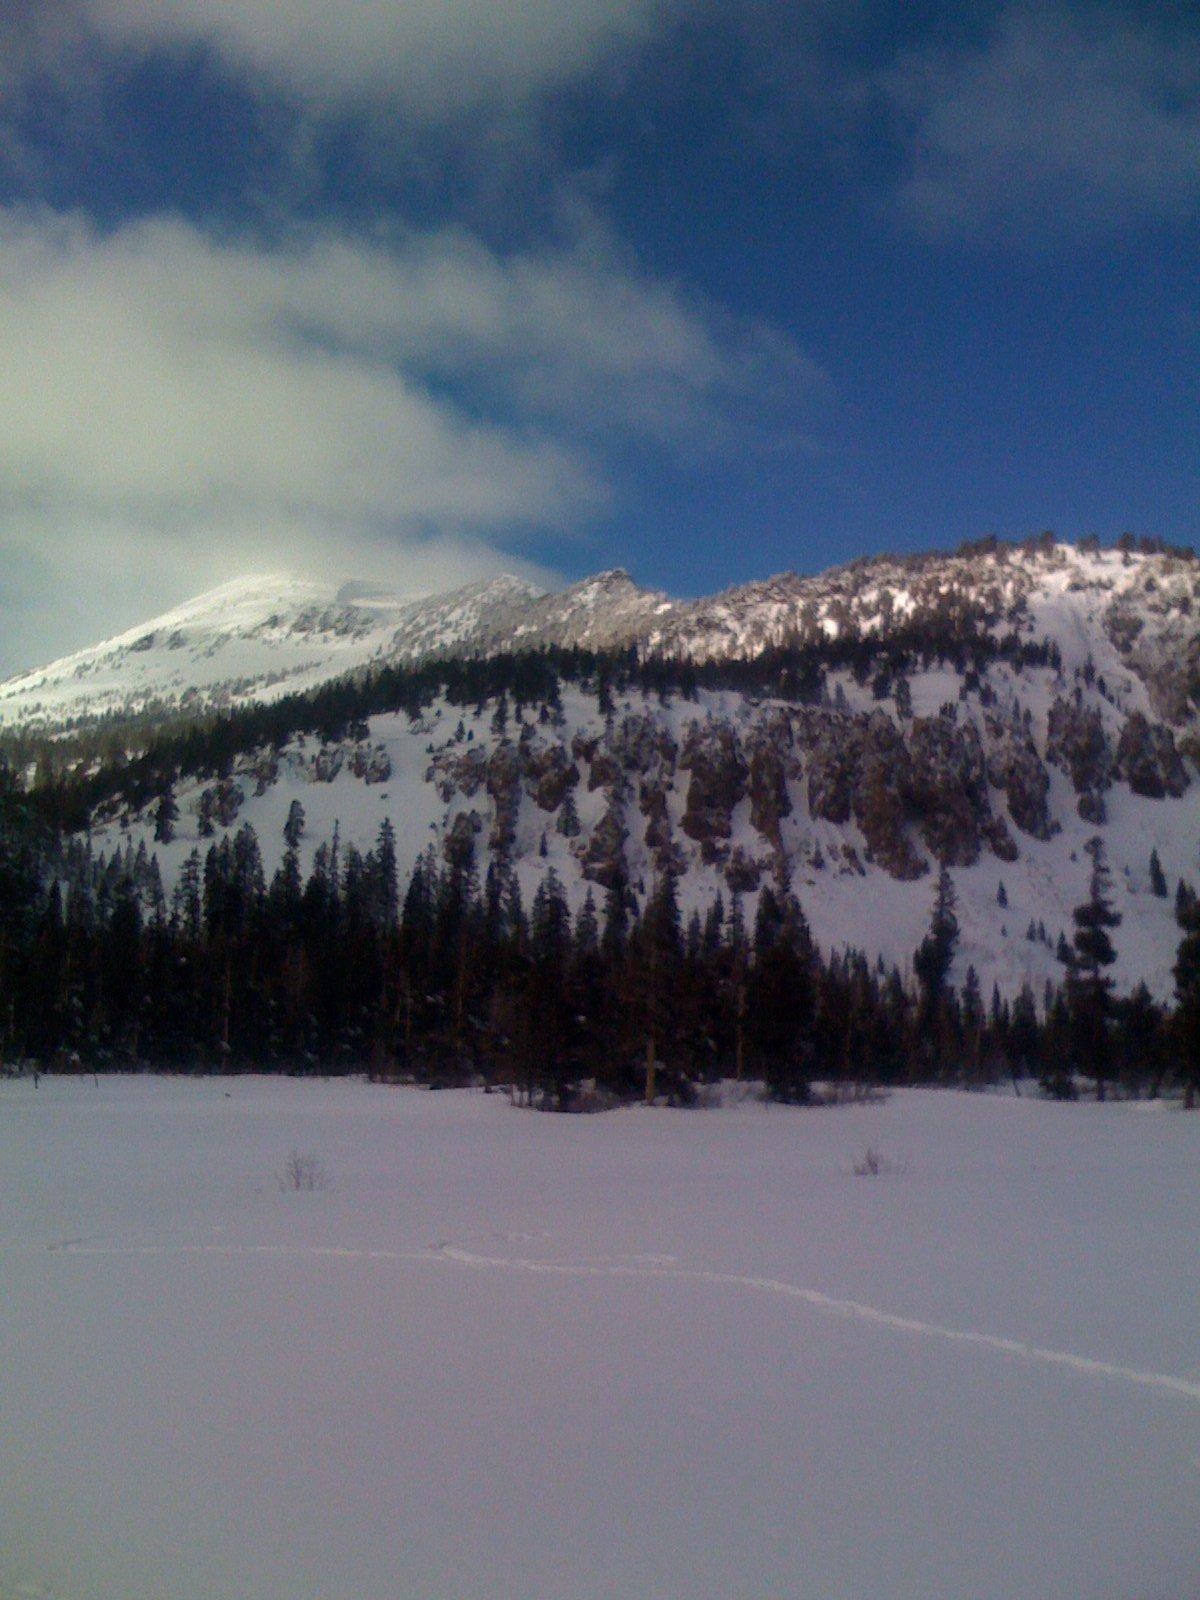 MaMMoth Mt.